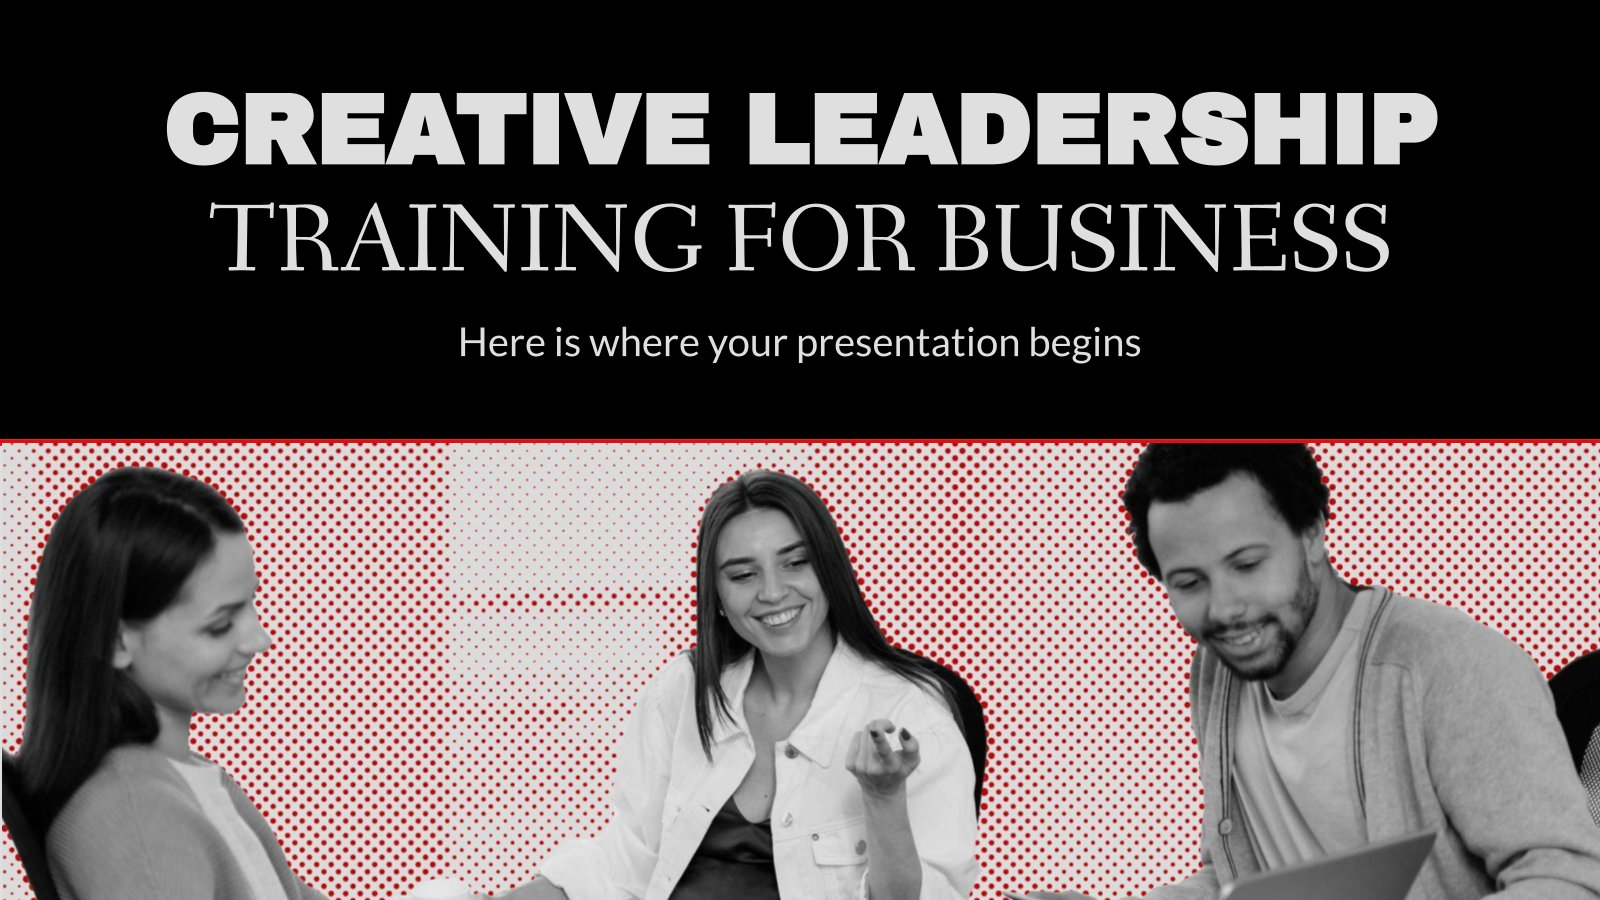 Creative Leadership Training for Business presentation template